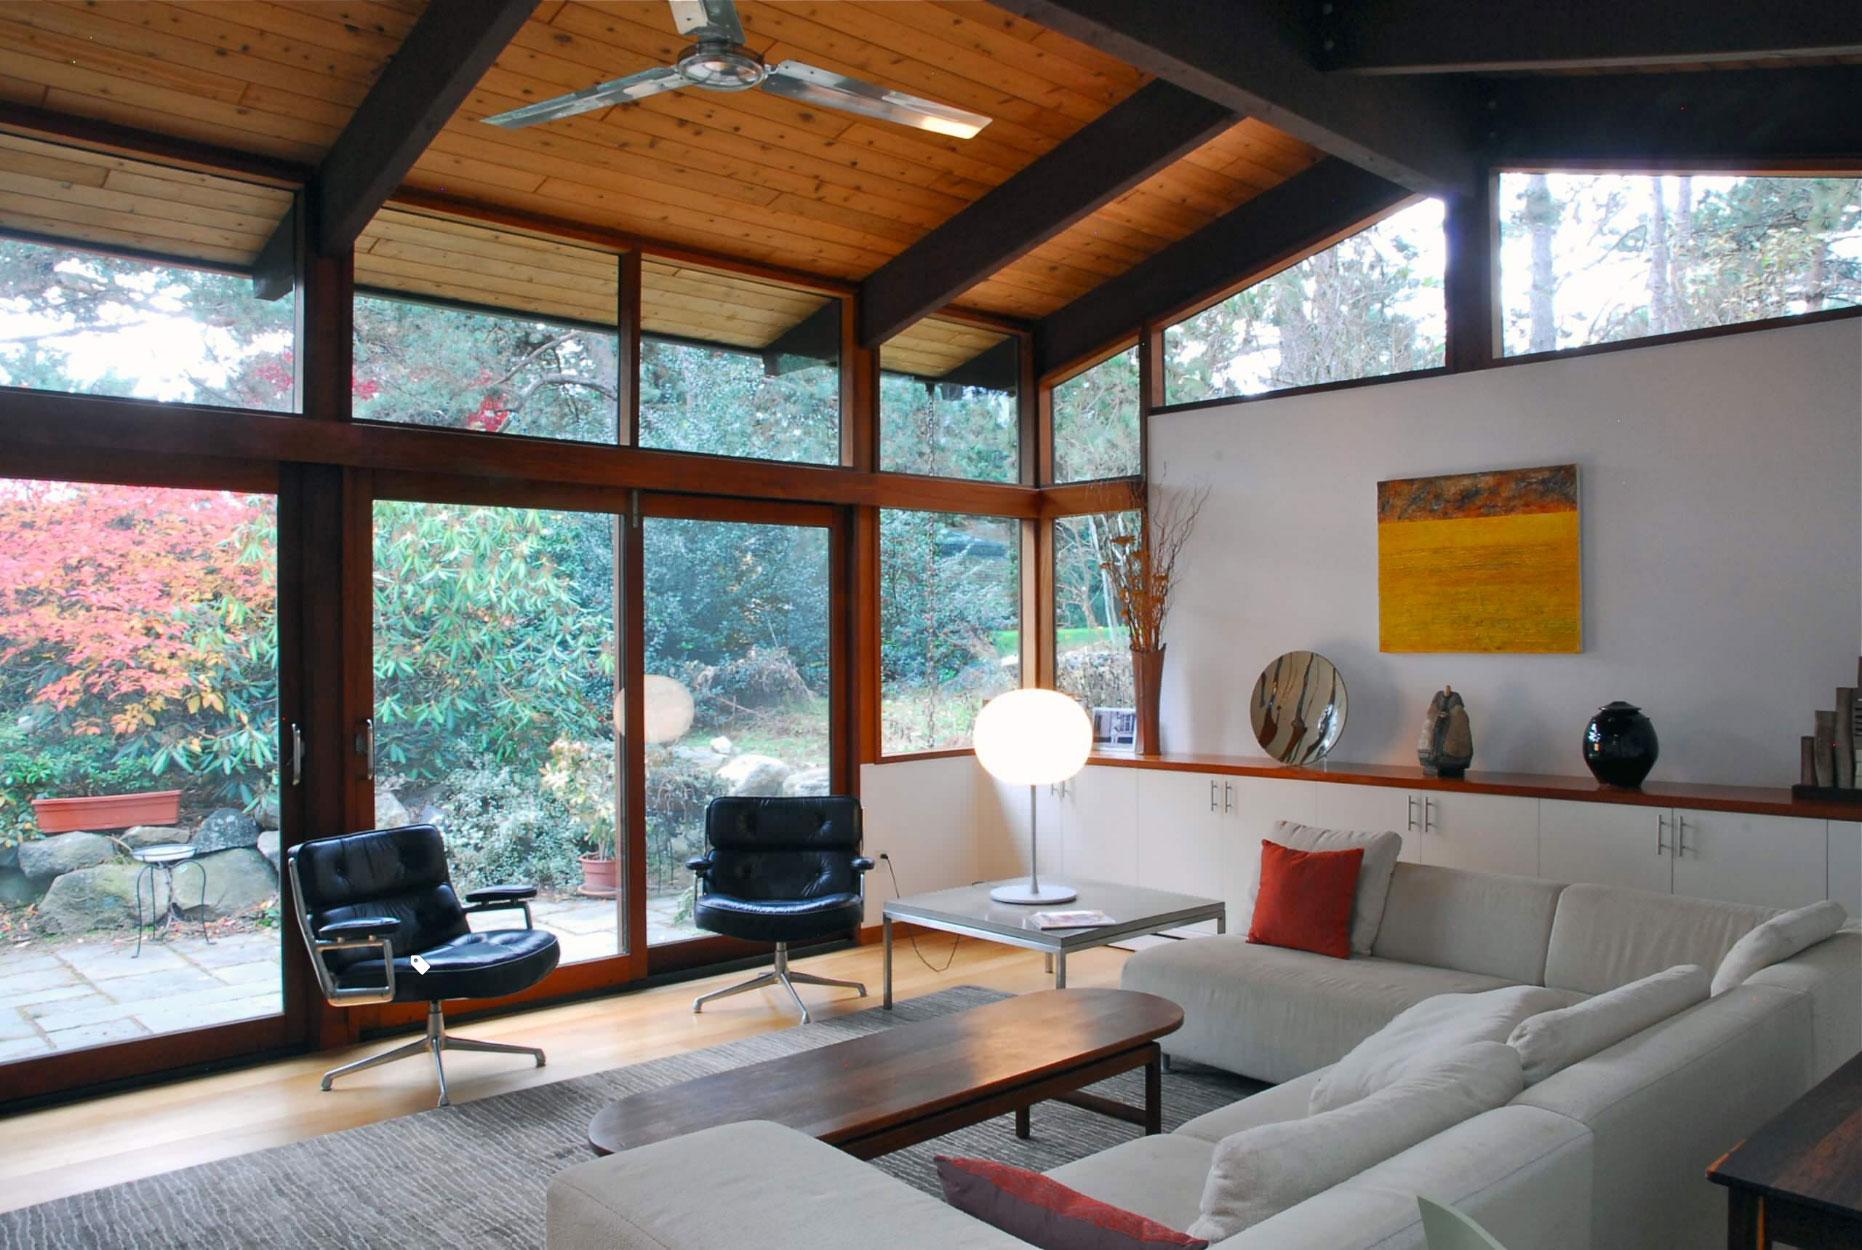 mid-century modern furnished interior large windows